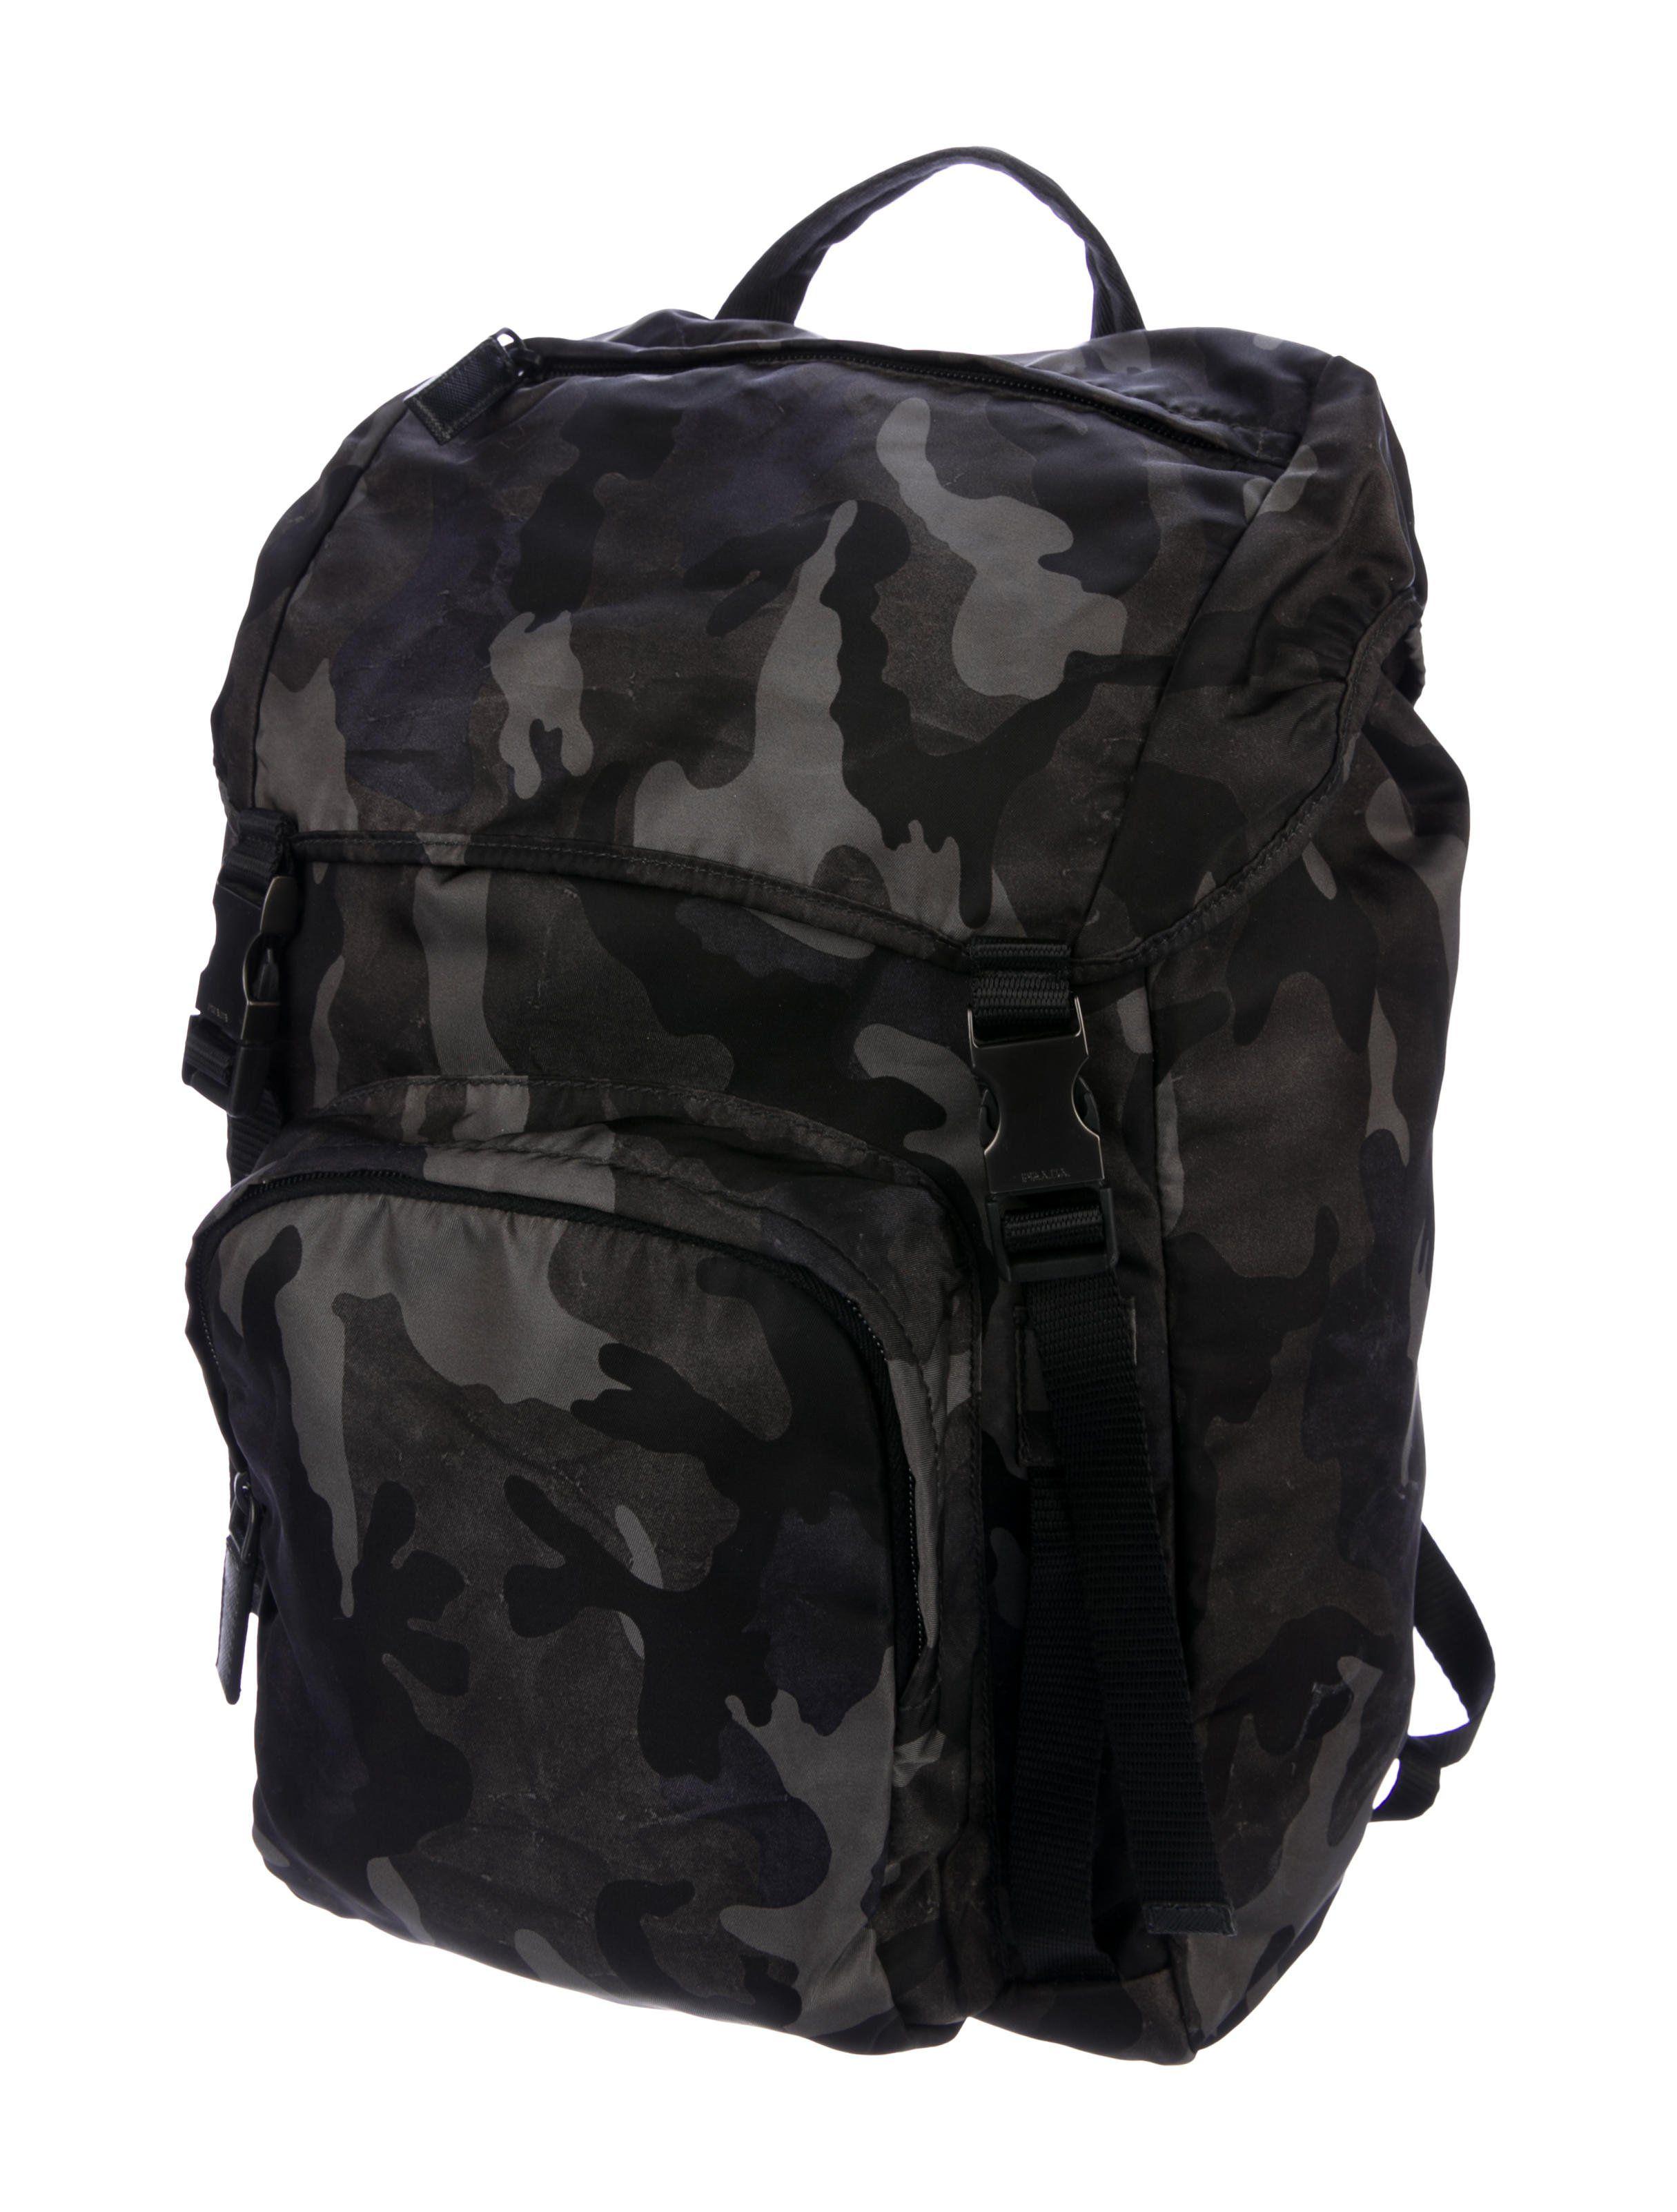 Men s charcoal and multicolor Tessuto nylon Prada Camouflage backpack with  gunmetal hardware f6682e35e399a